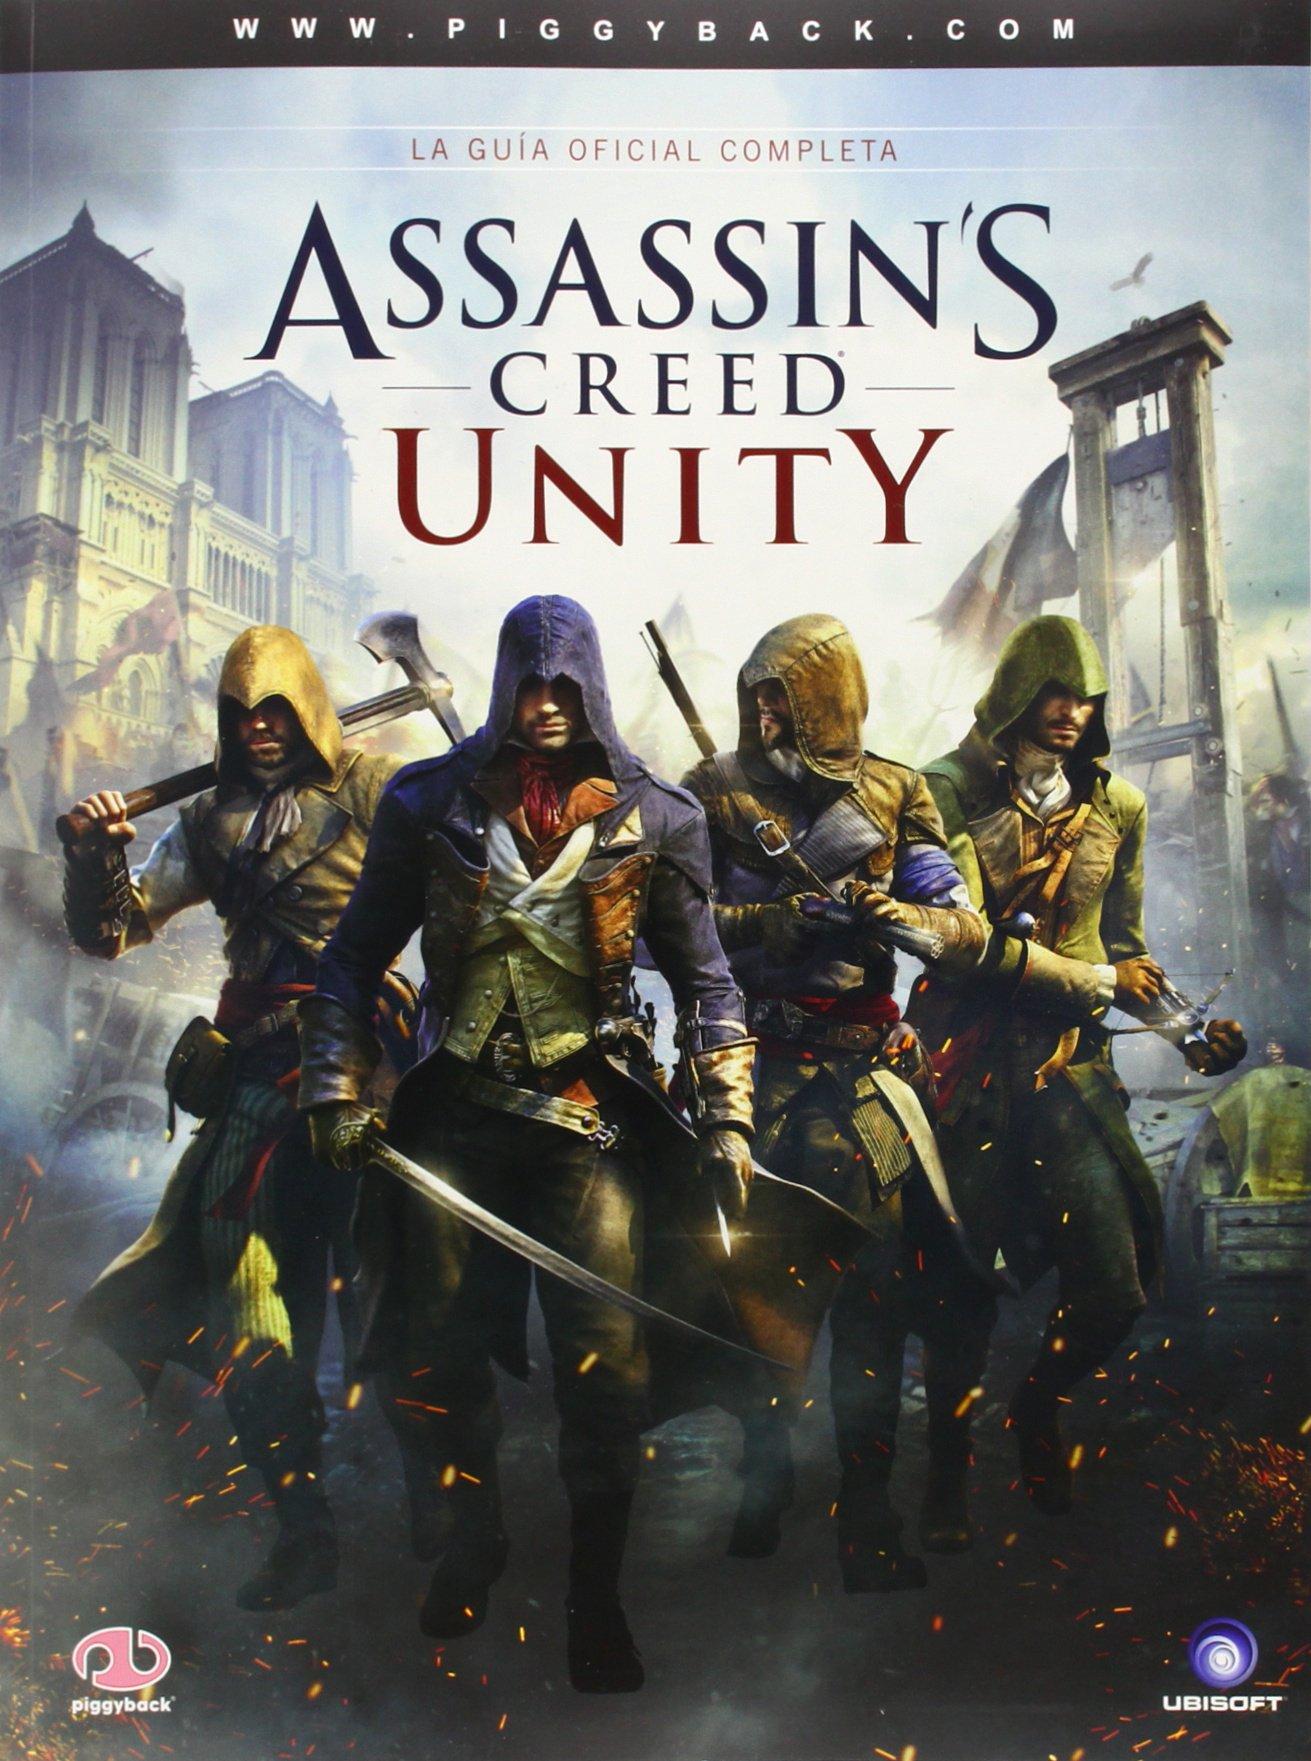 Guía Assassin's Creed Unity Tapa blanda – 13 nov 2014 Vv.Aa. Piggyback 1908172703 arte